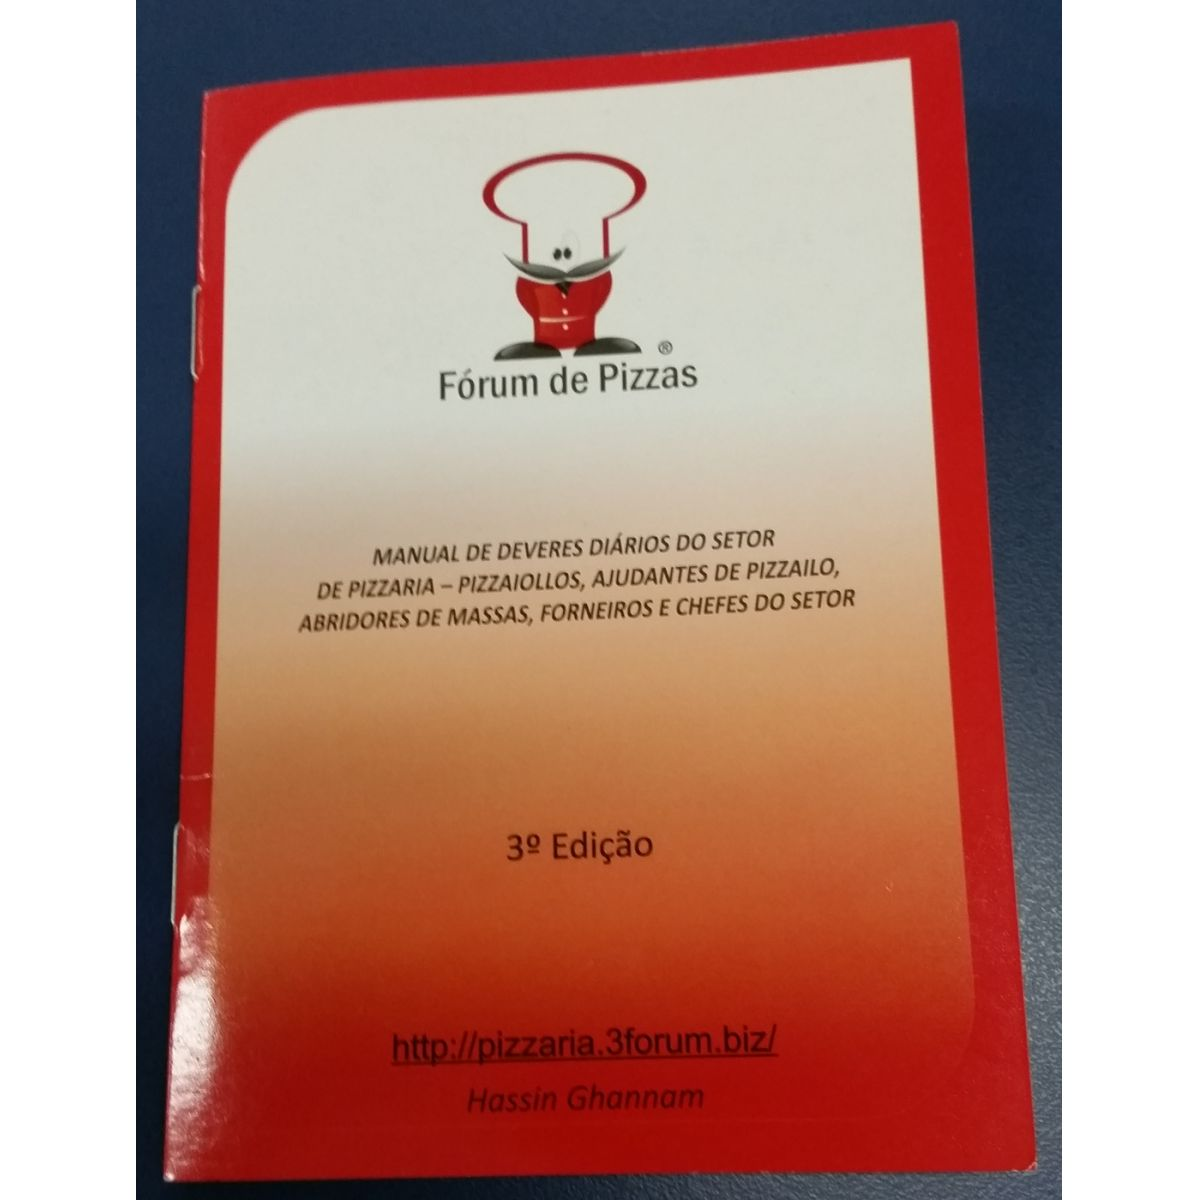 TRILOGIA DOS DVDS VOLUMES I, II, III POR PAC  - F�rum de Pizzas Vendas online